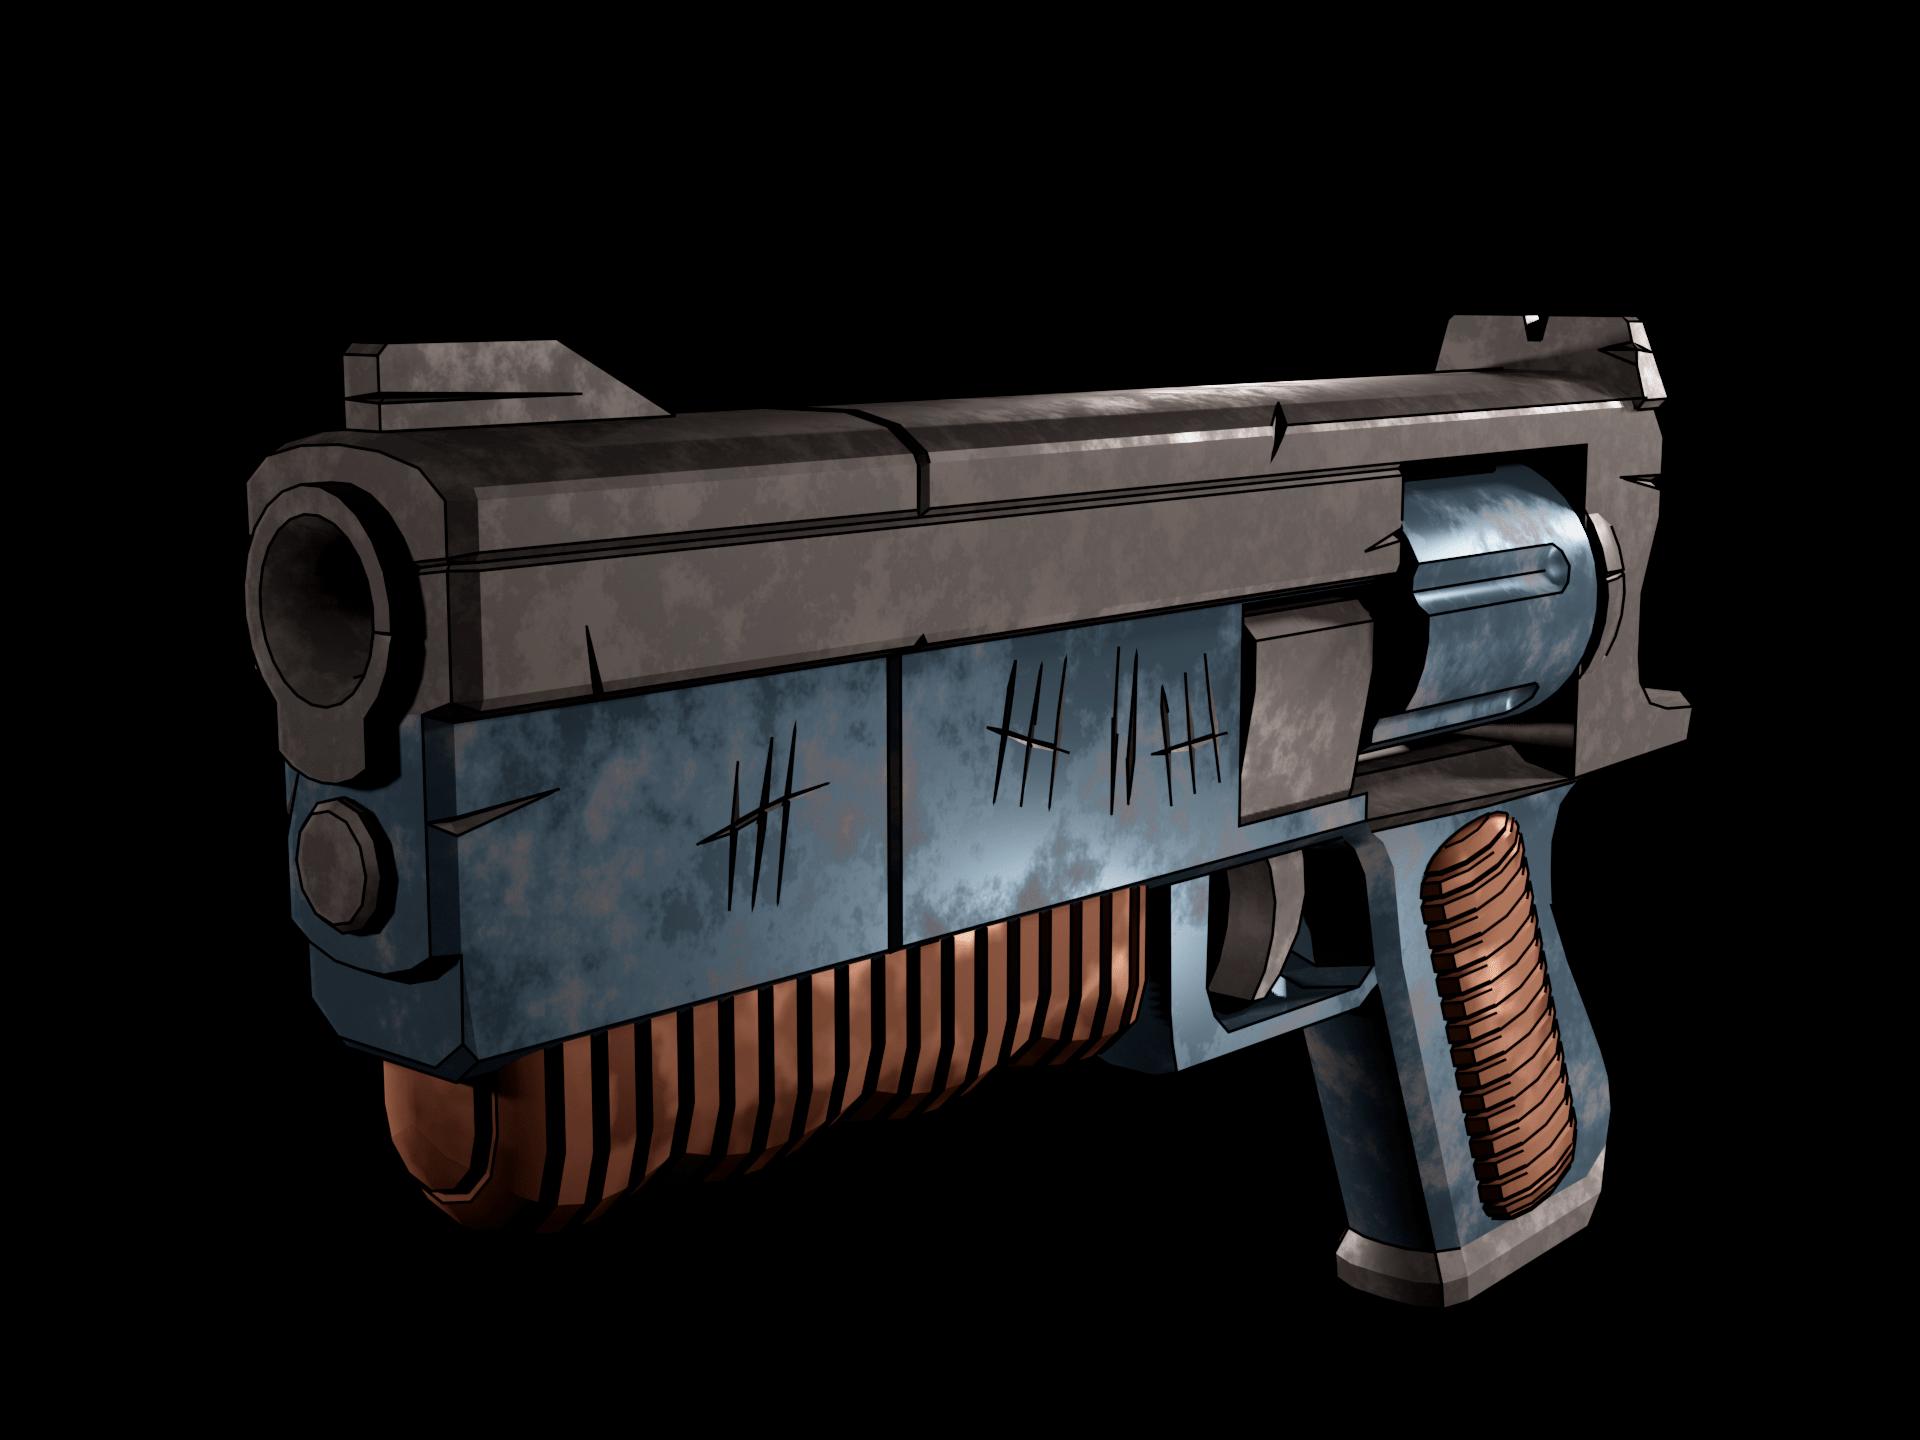 Fallout 1 Colt 6520 | 3D моделлер, ищу разовые заказы/команду инди разработчиков